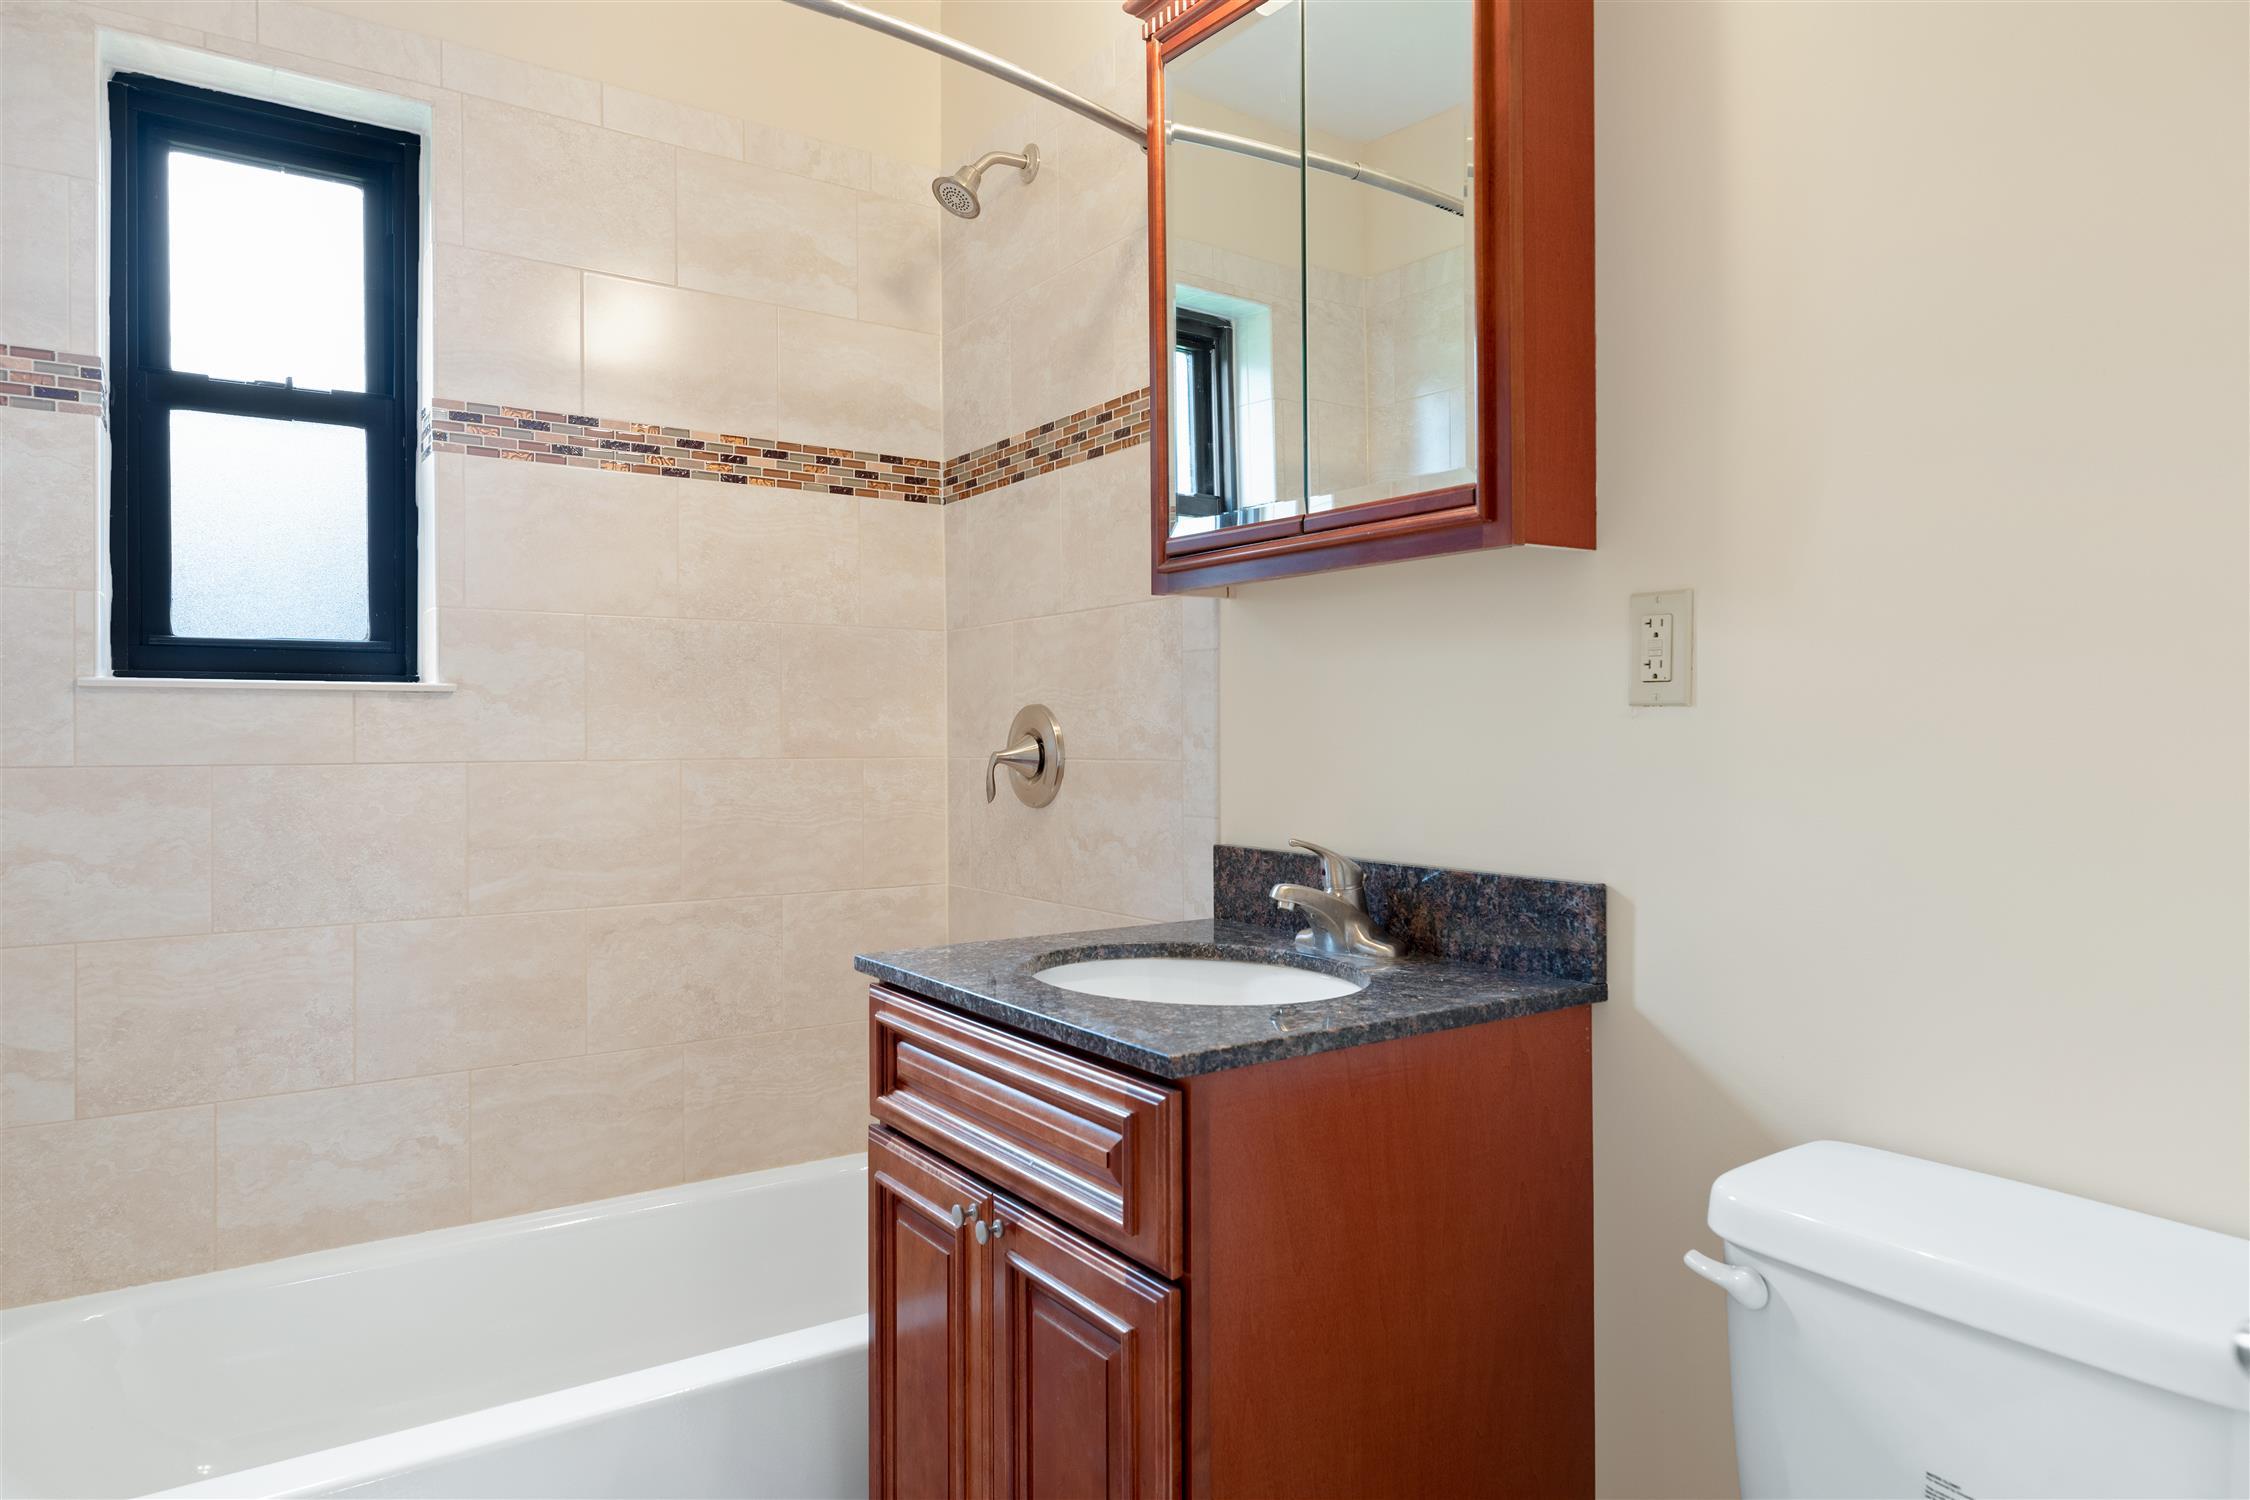 Eagle Rock Apartments at Hicksville/Jericho - Hicksville, NY